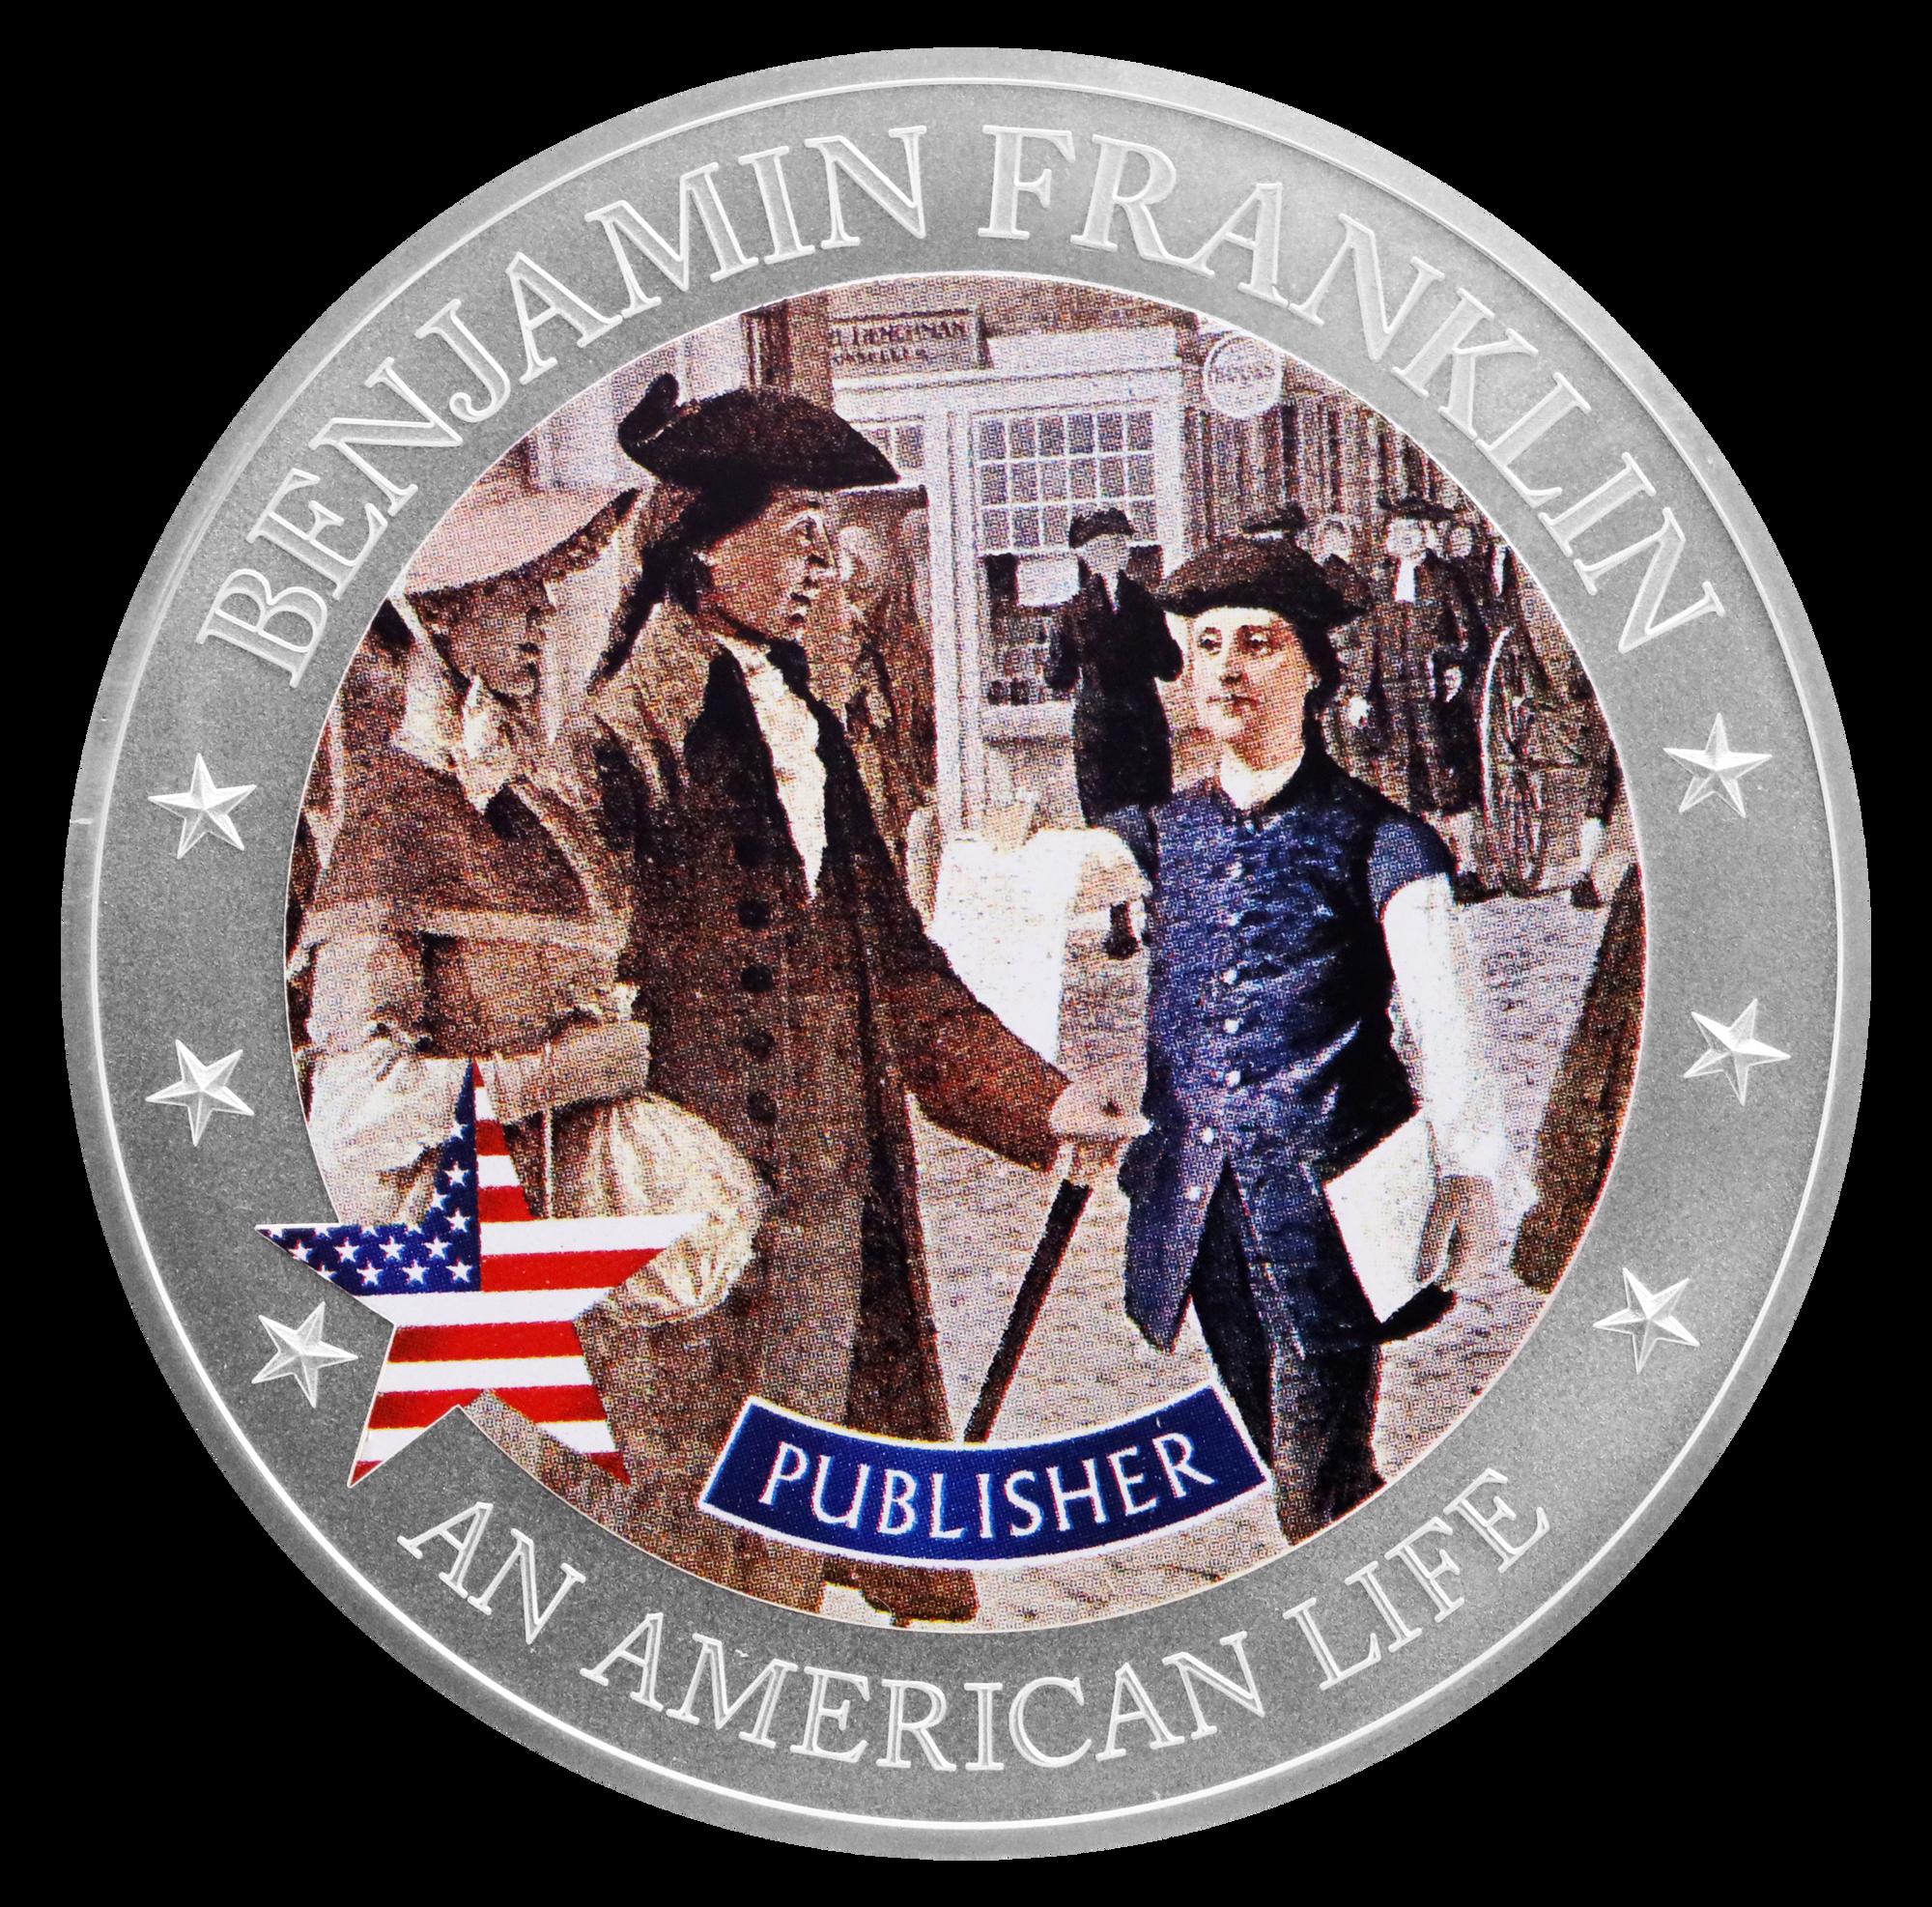 2021 An American Life Benjamin Franklin Publisher 1/2 oz Silver Coin